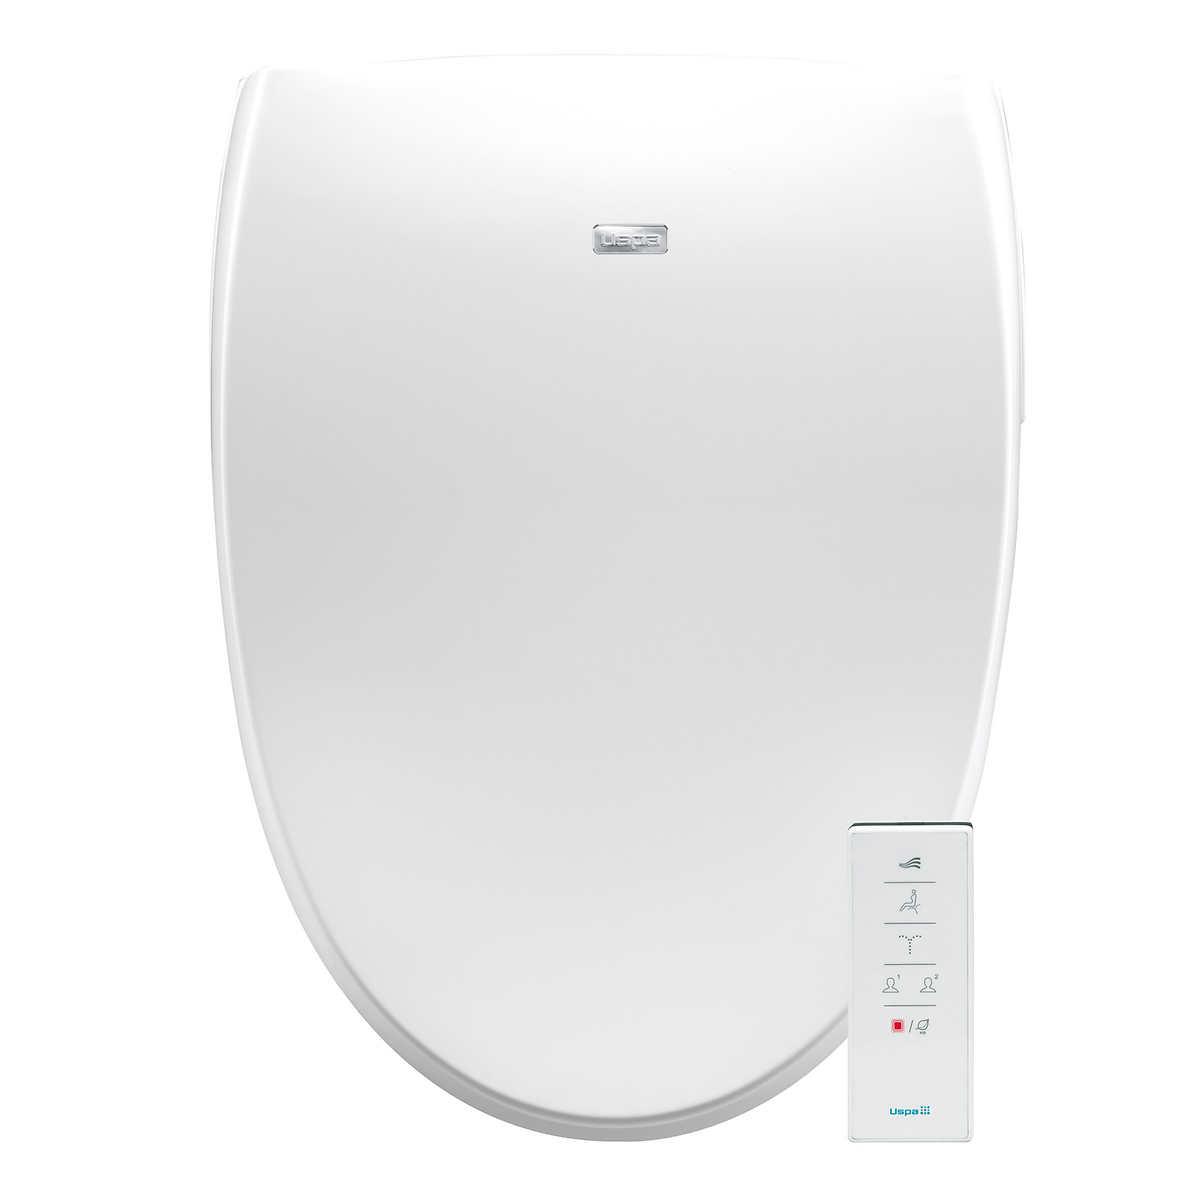 Bio Bidet A8 Serenity Smart Bidet Toilet Seat